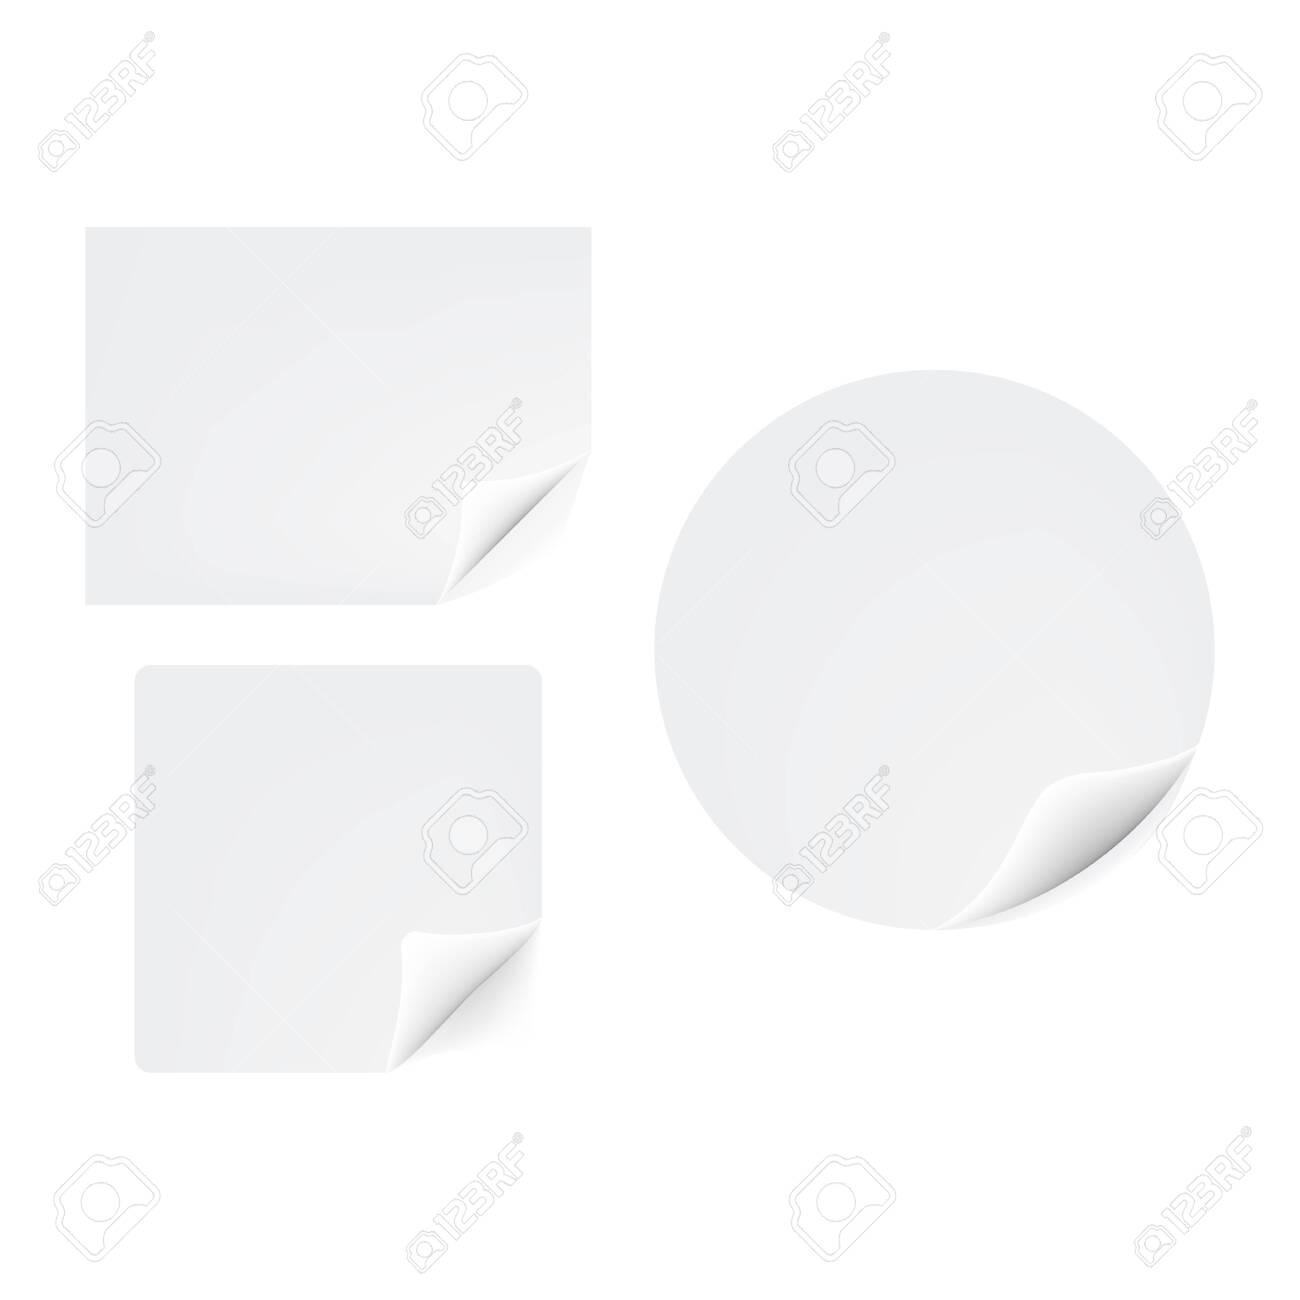 Gebogene papier aufkleber icon vector illustration design - 144721993